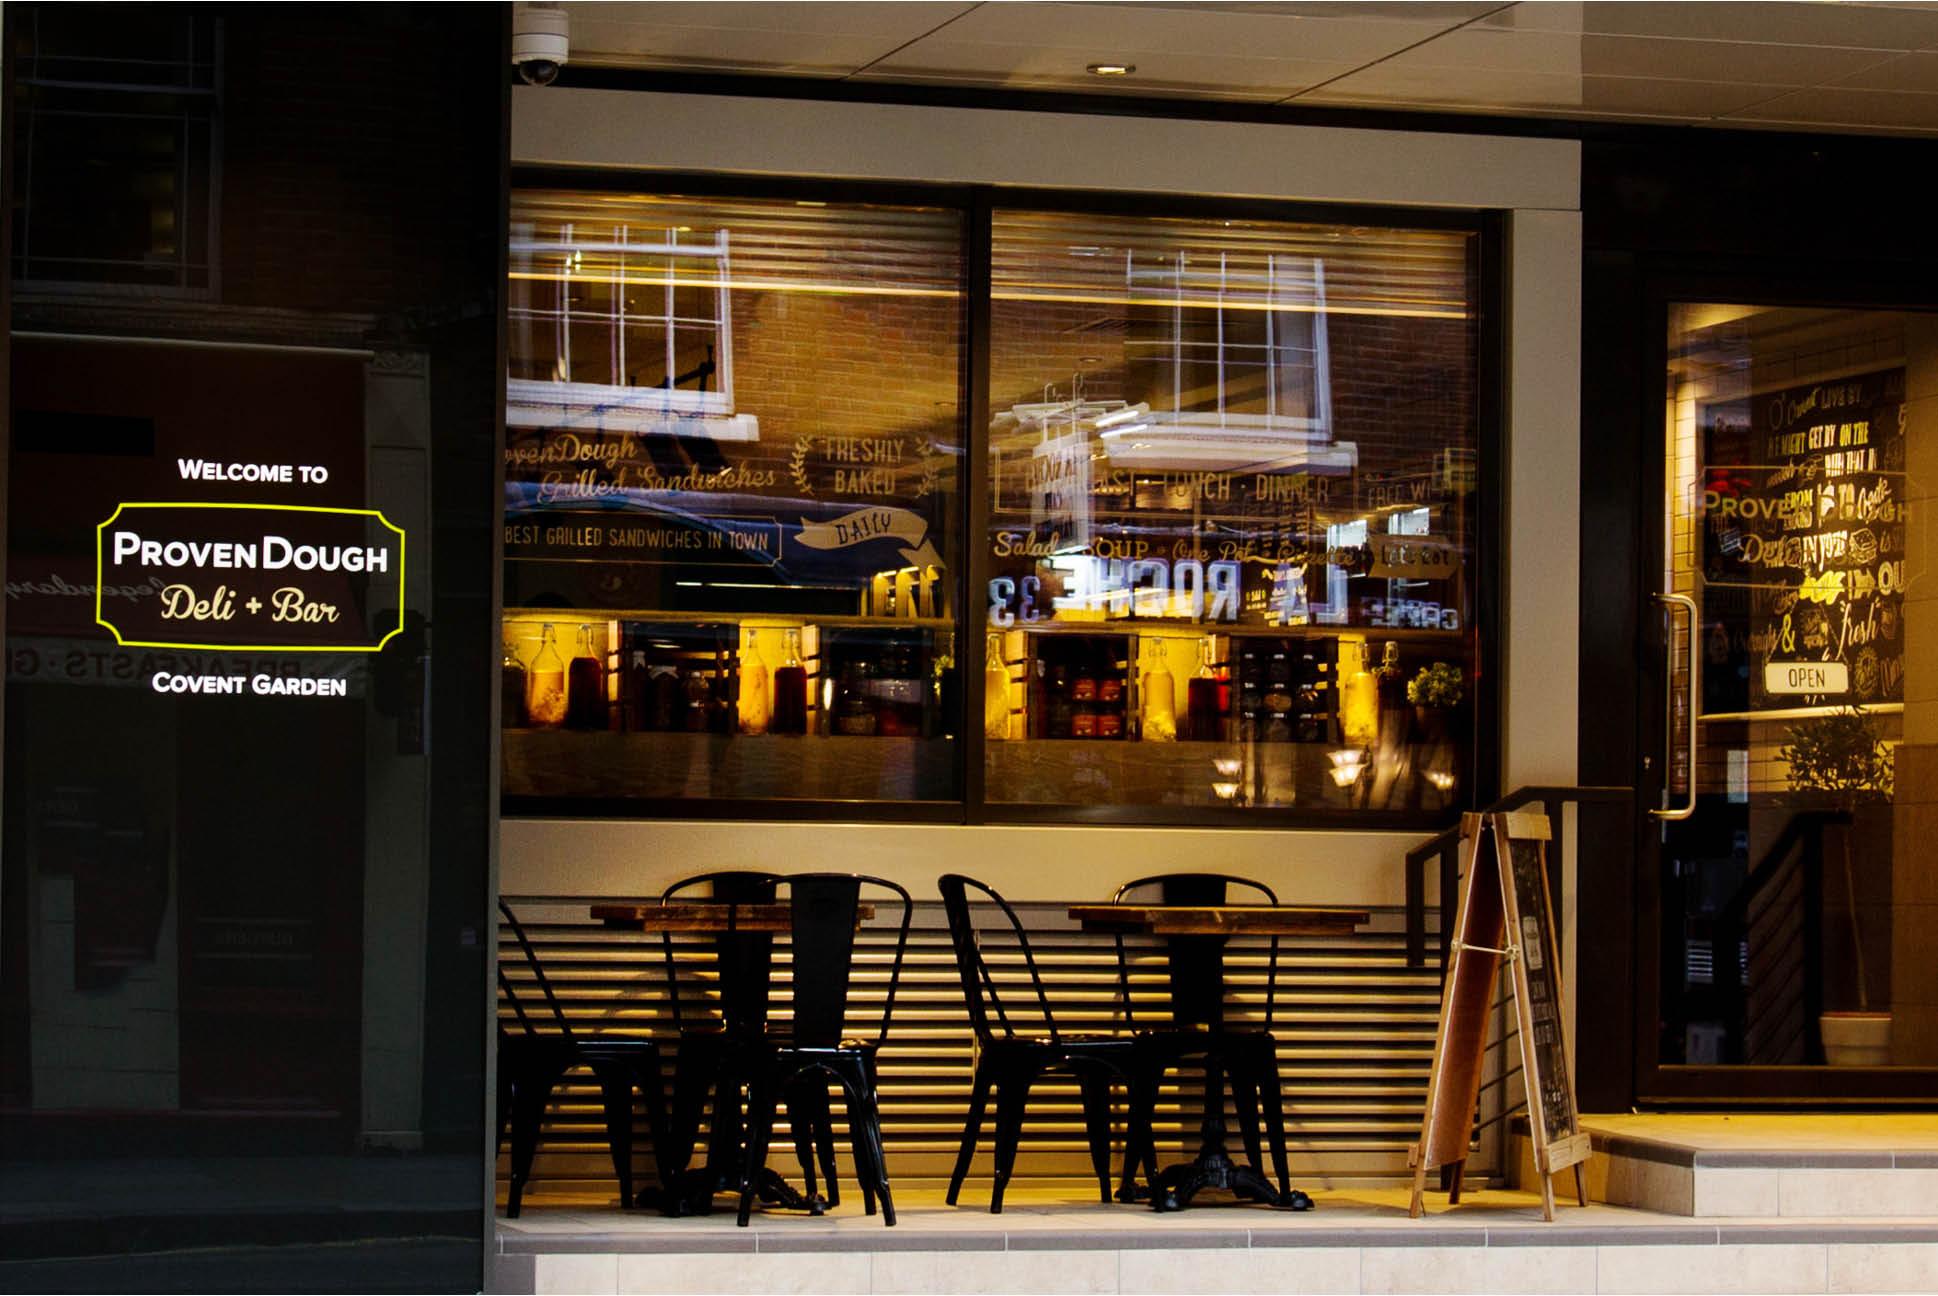 ProvenDough Signage | Branding and Identity Design - Independent Marketing | IM London